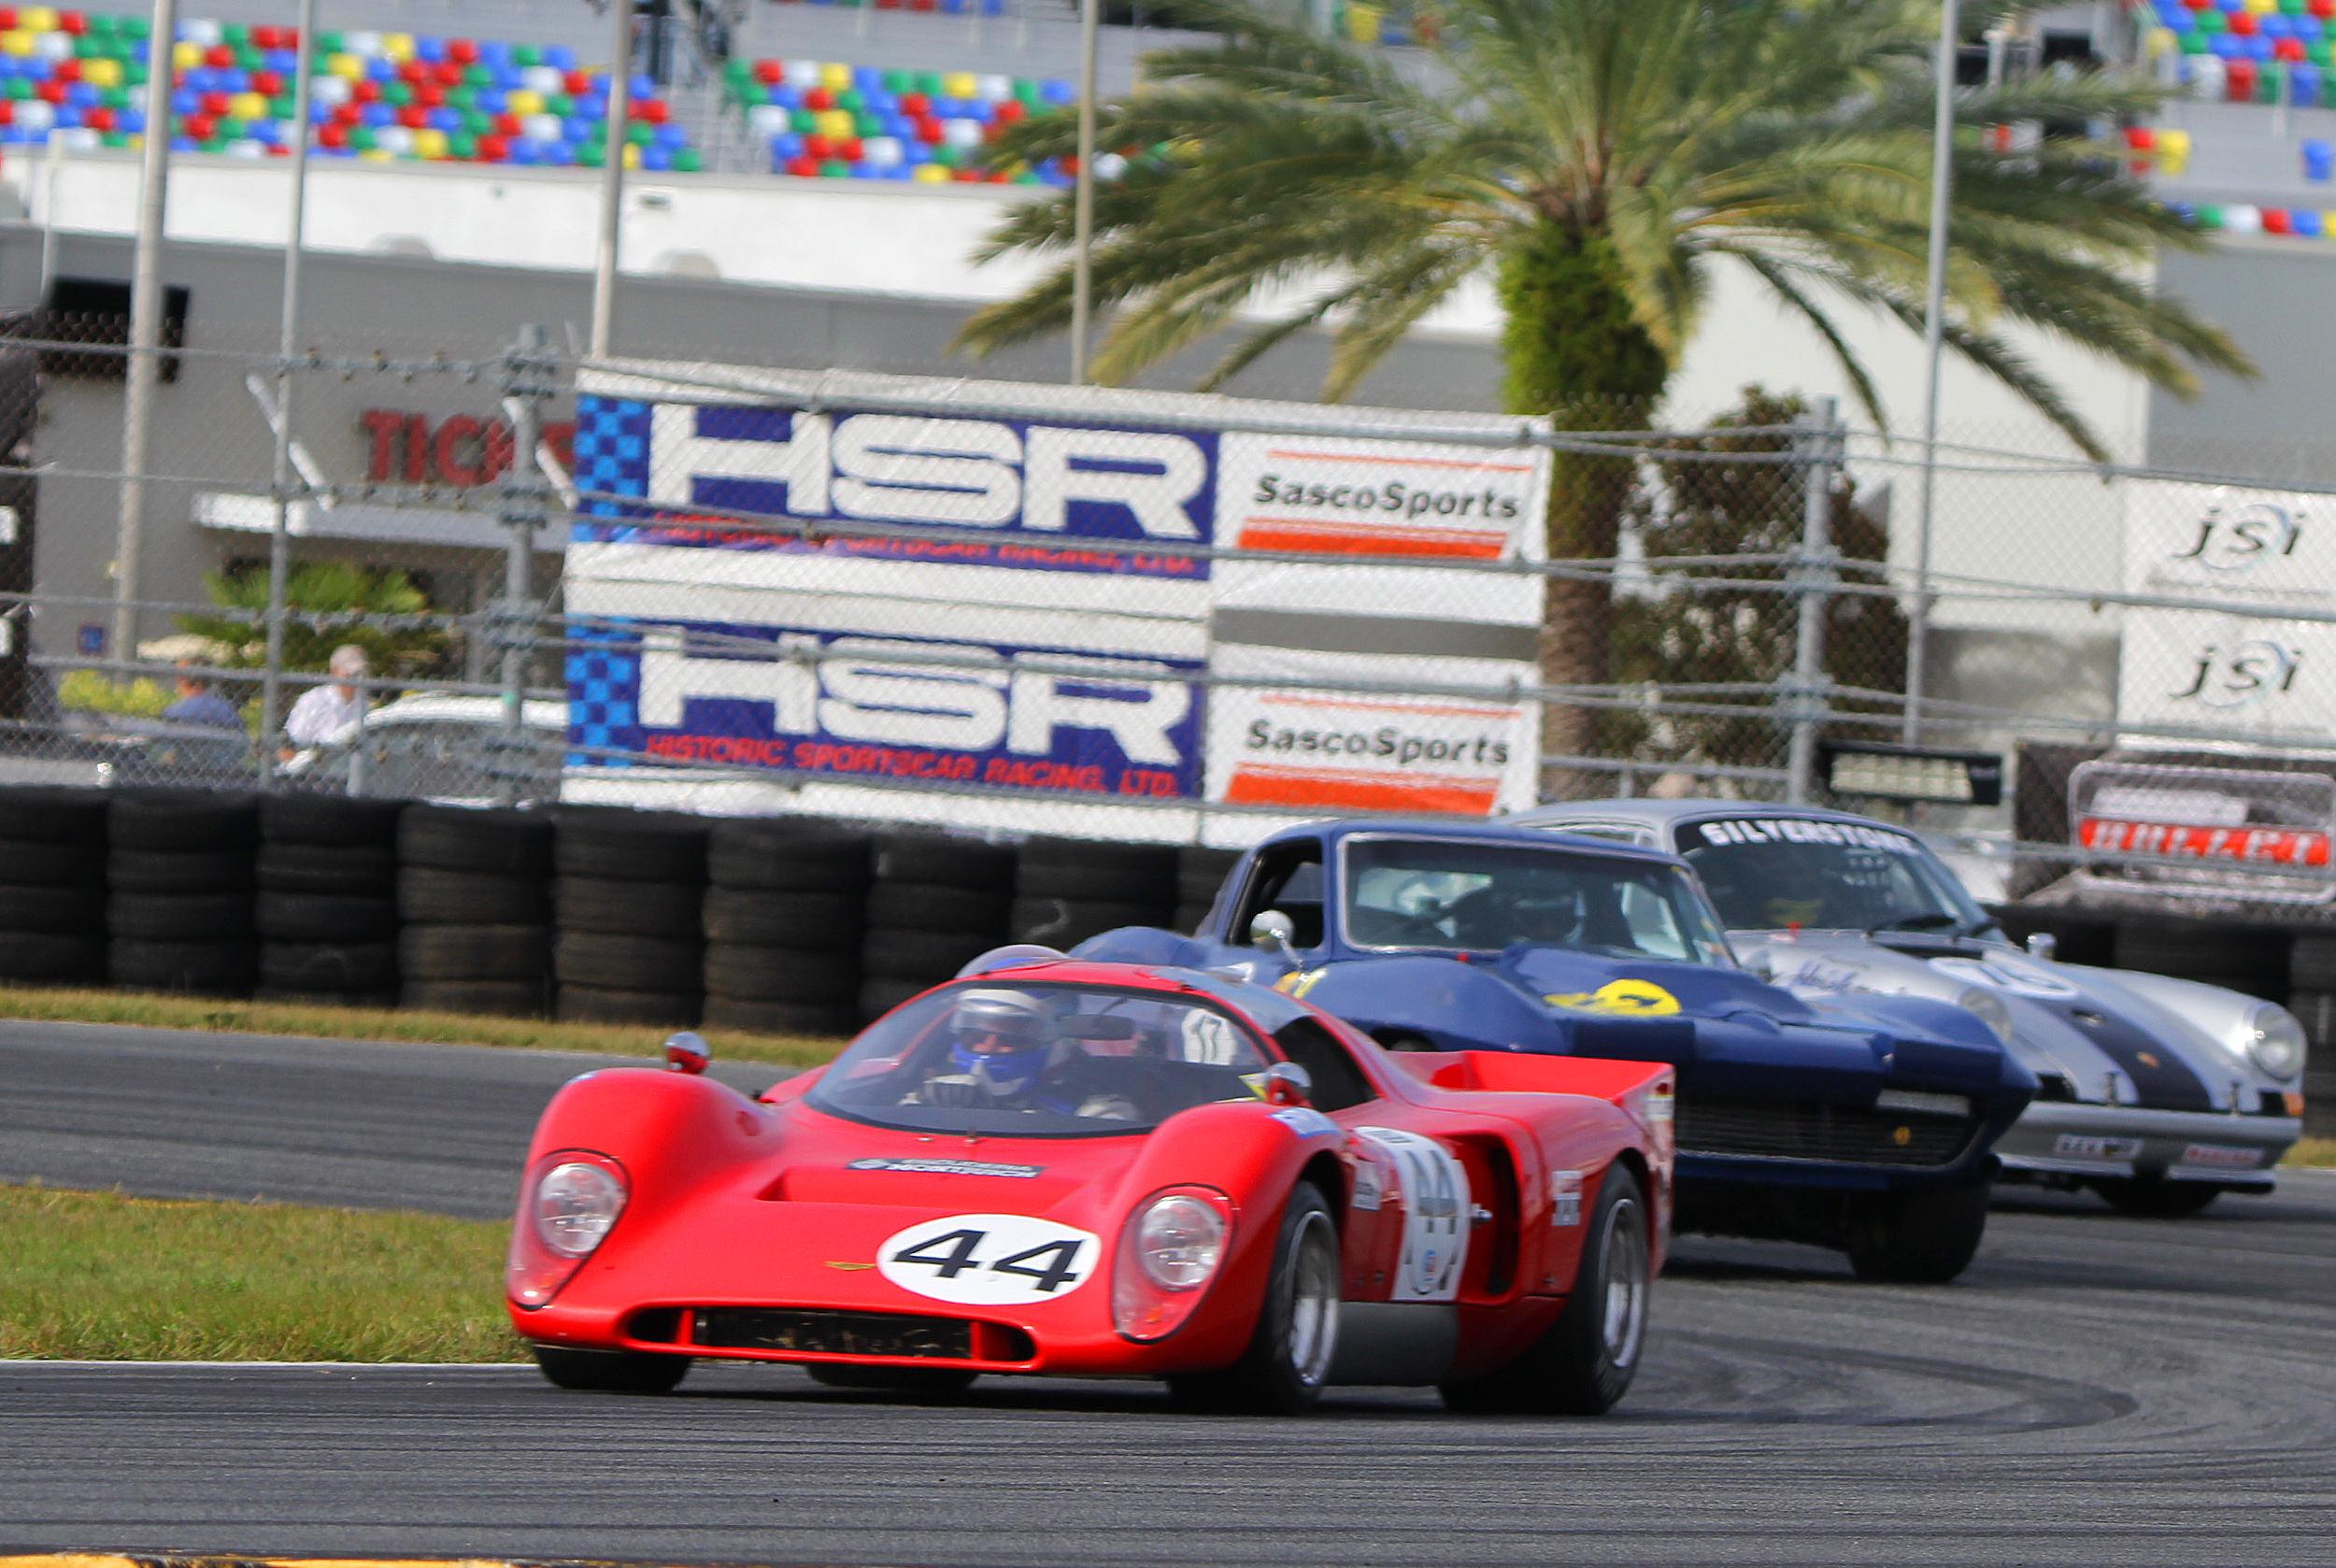 HSR Classic 24 at Daytona Back and Even Better | IMSA | racing | The ...